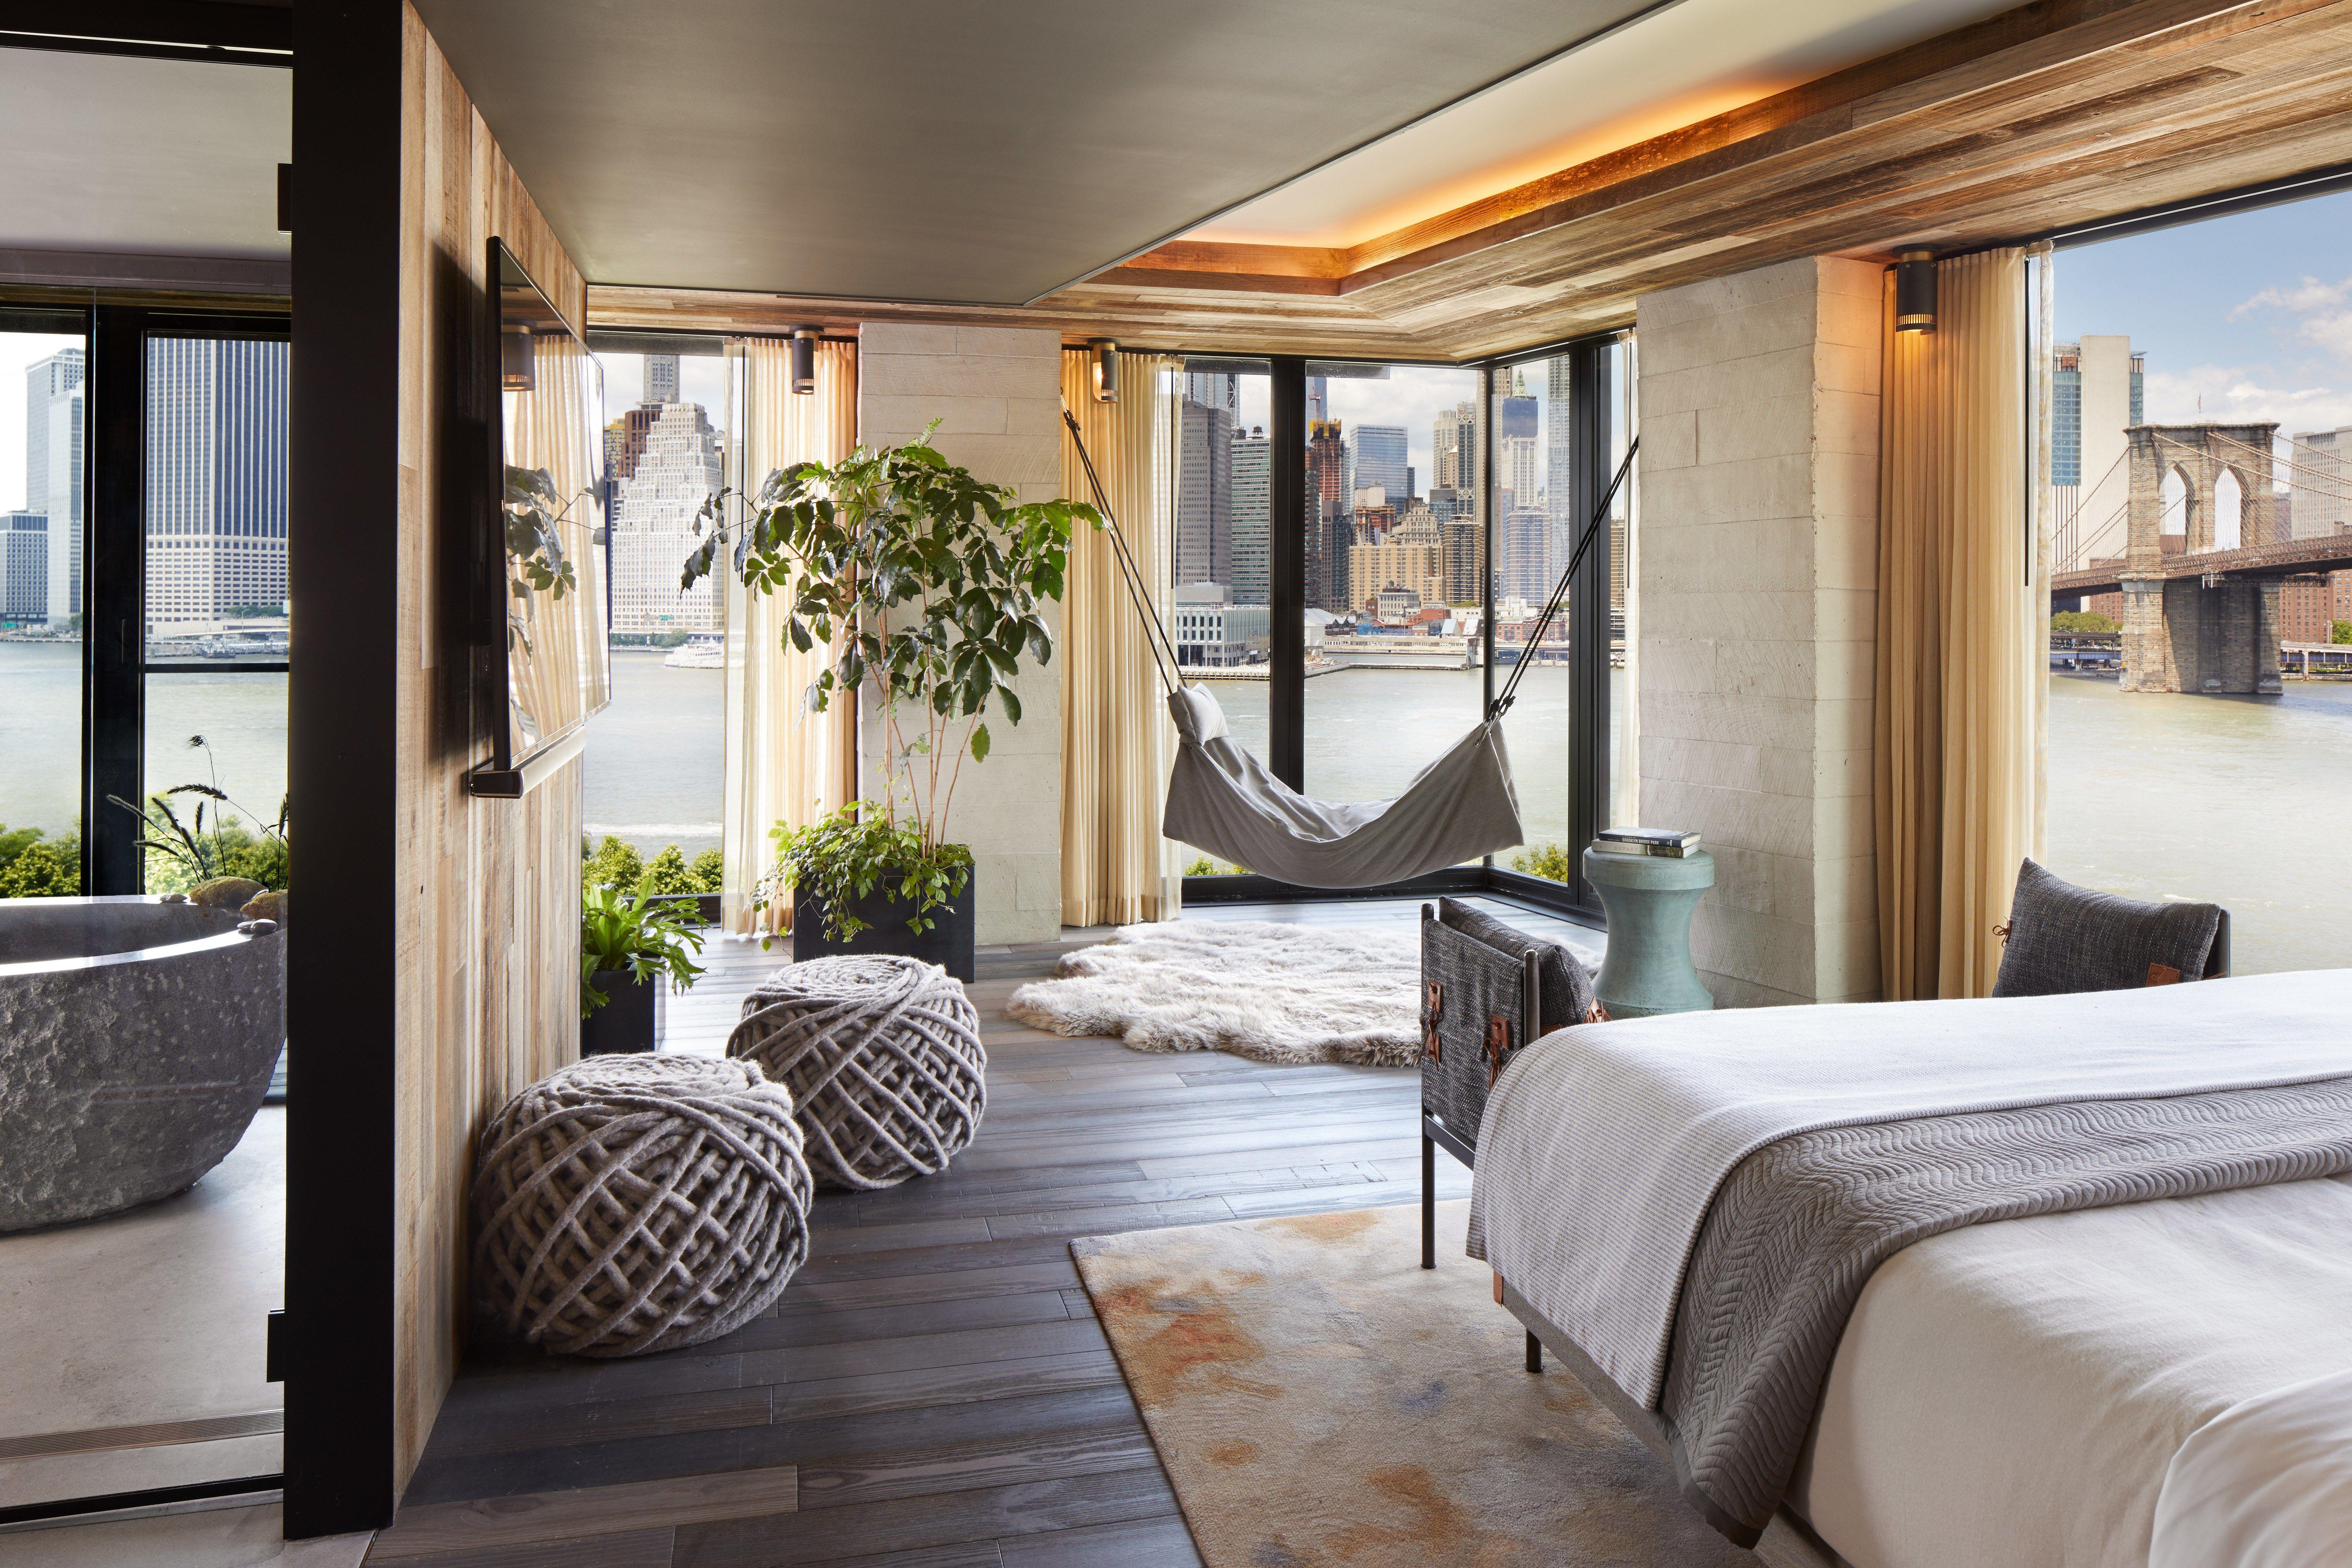 1180 best Hotels & resorts images on Pinterest